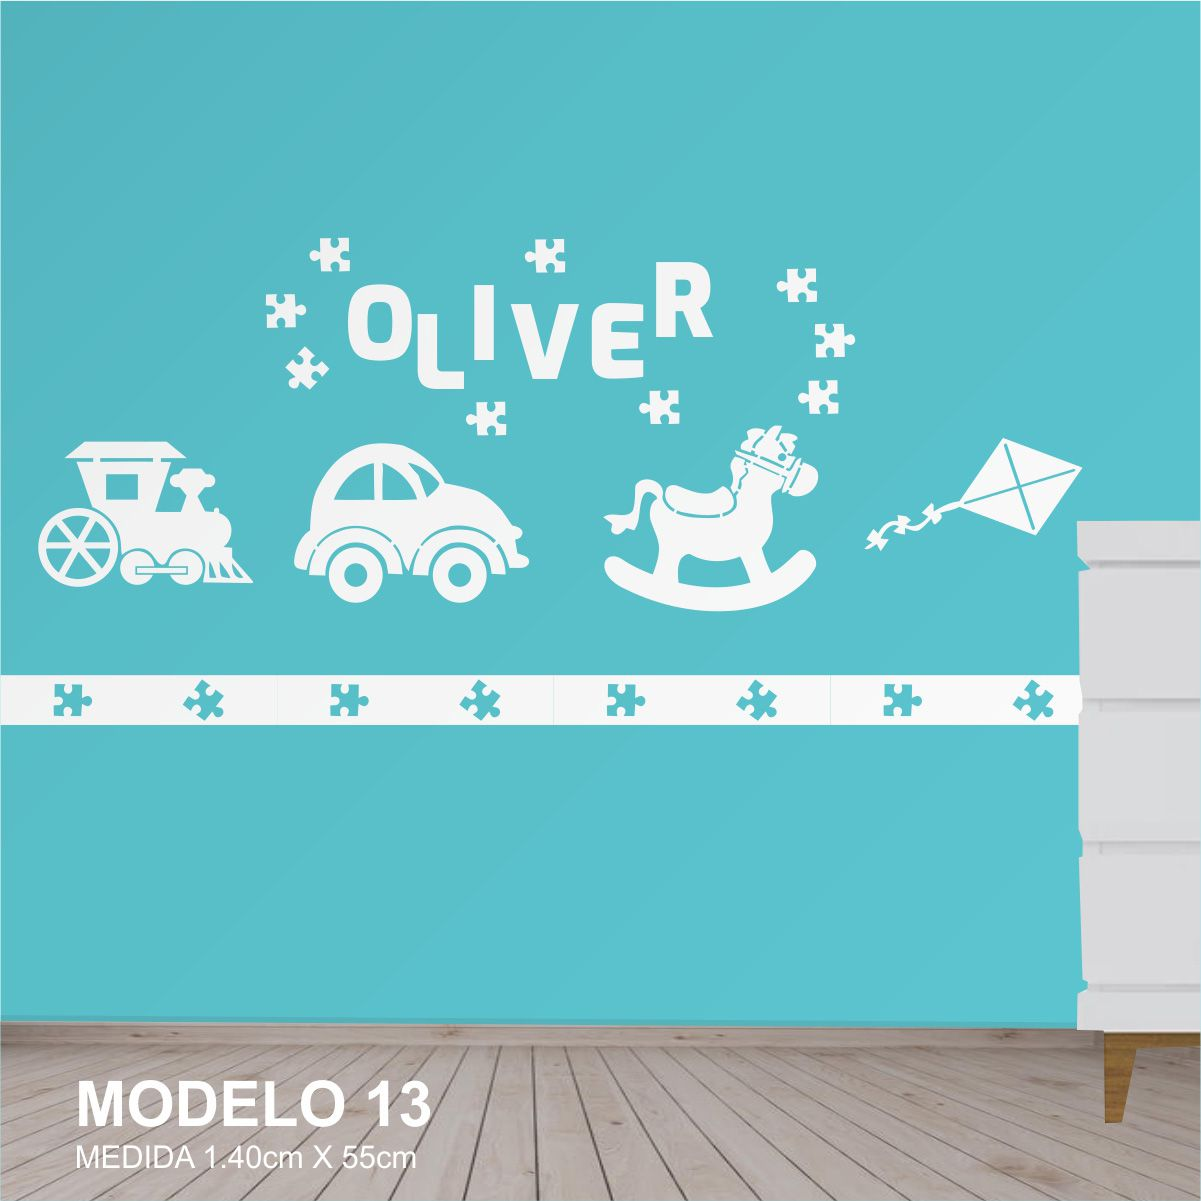 Painel Decorativo Quarto Infantil Menino Brinquedos Mdf Cru